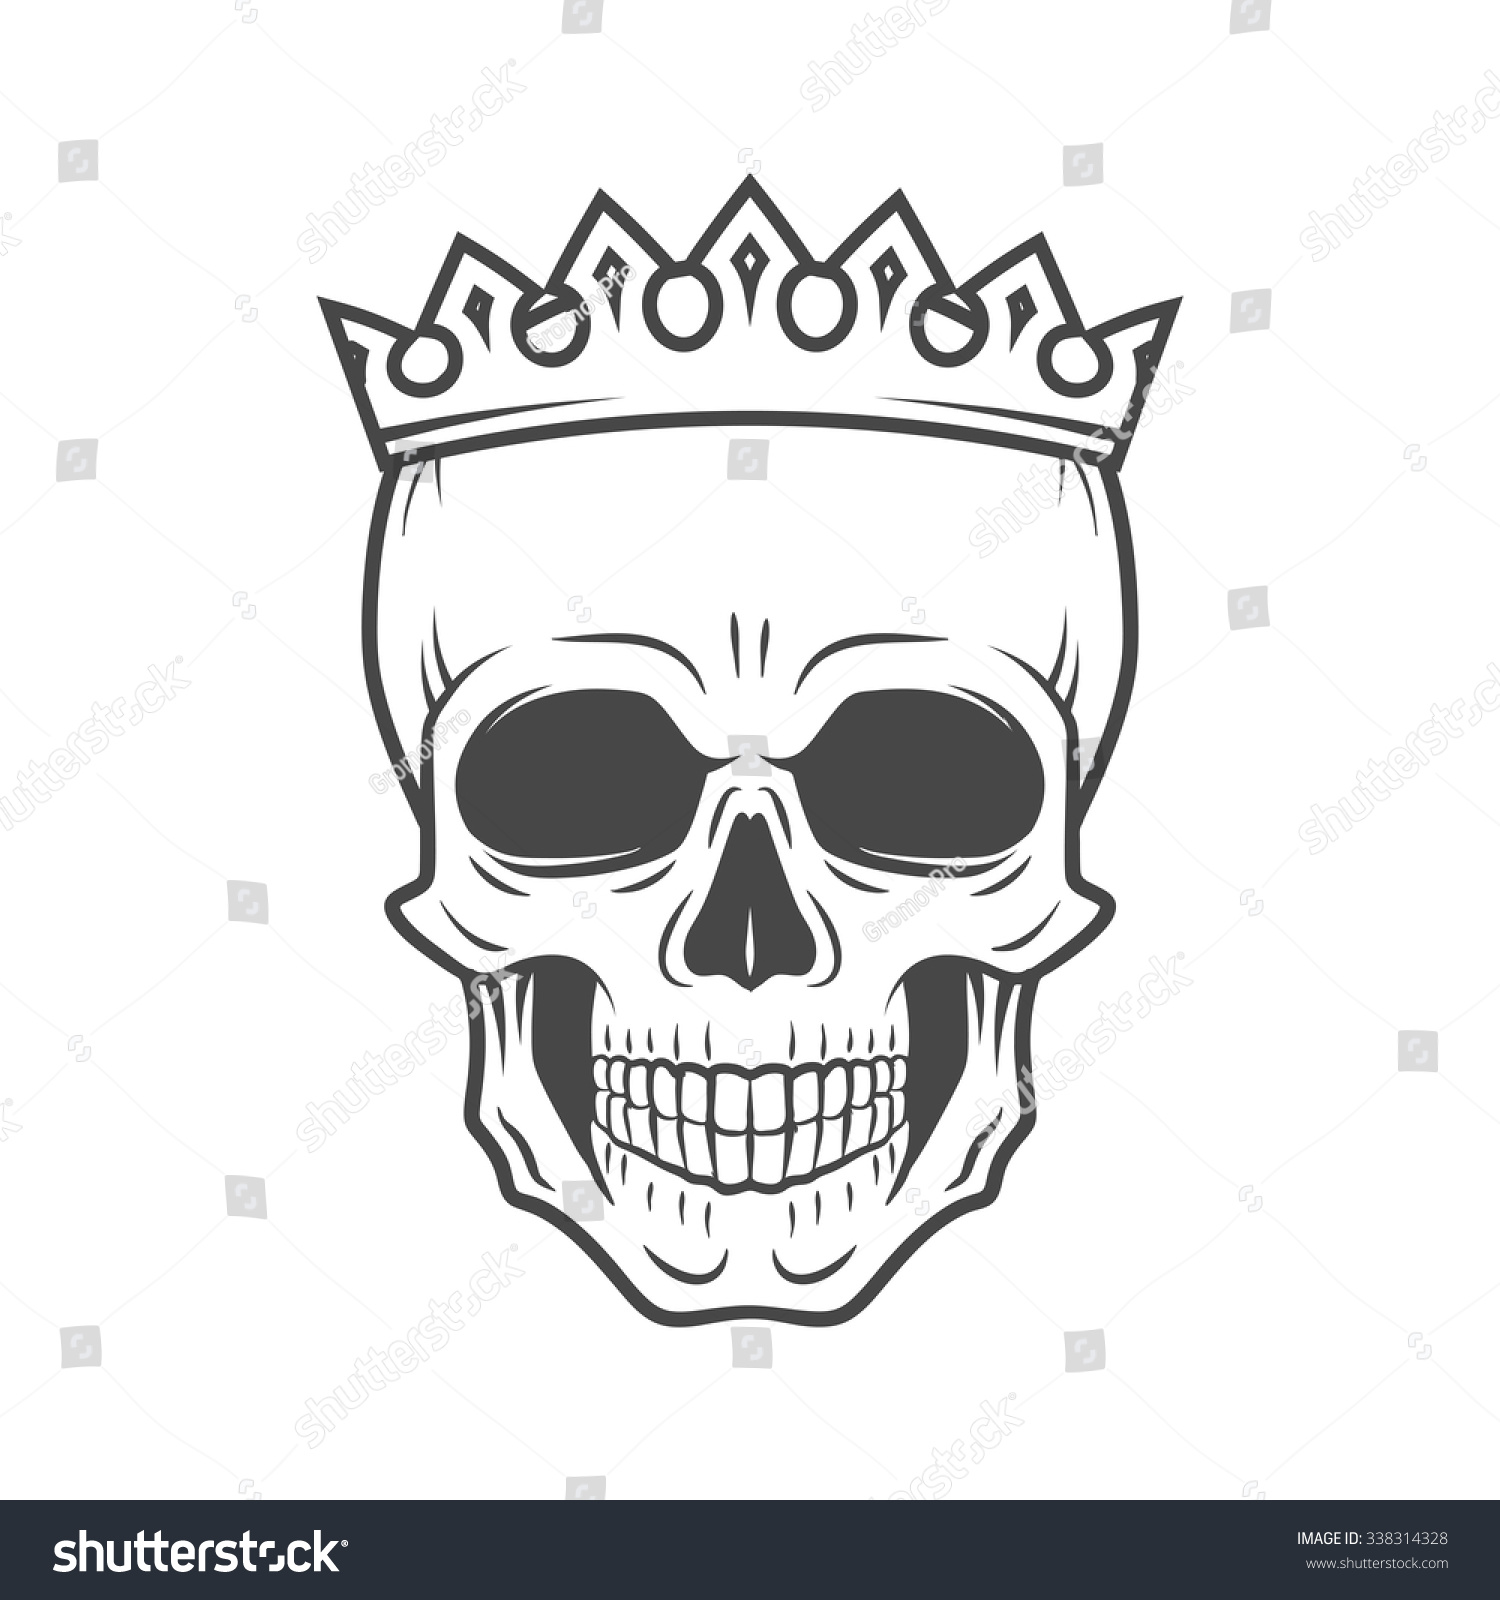 Skull King Crown Design Element Vintage Stock Vector 338314328 Shutterstock